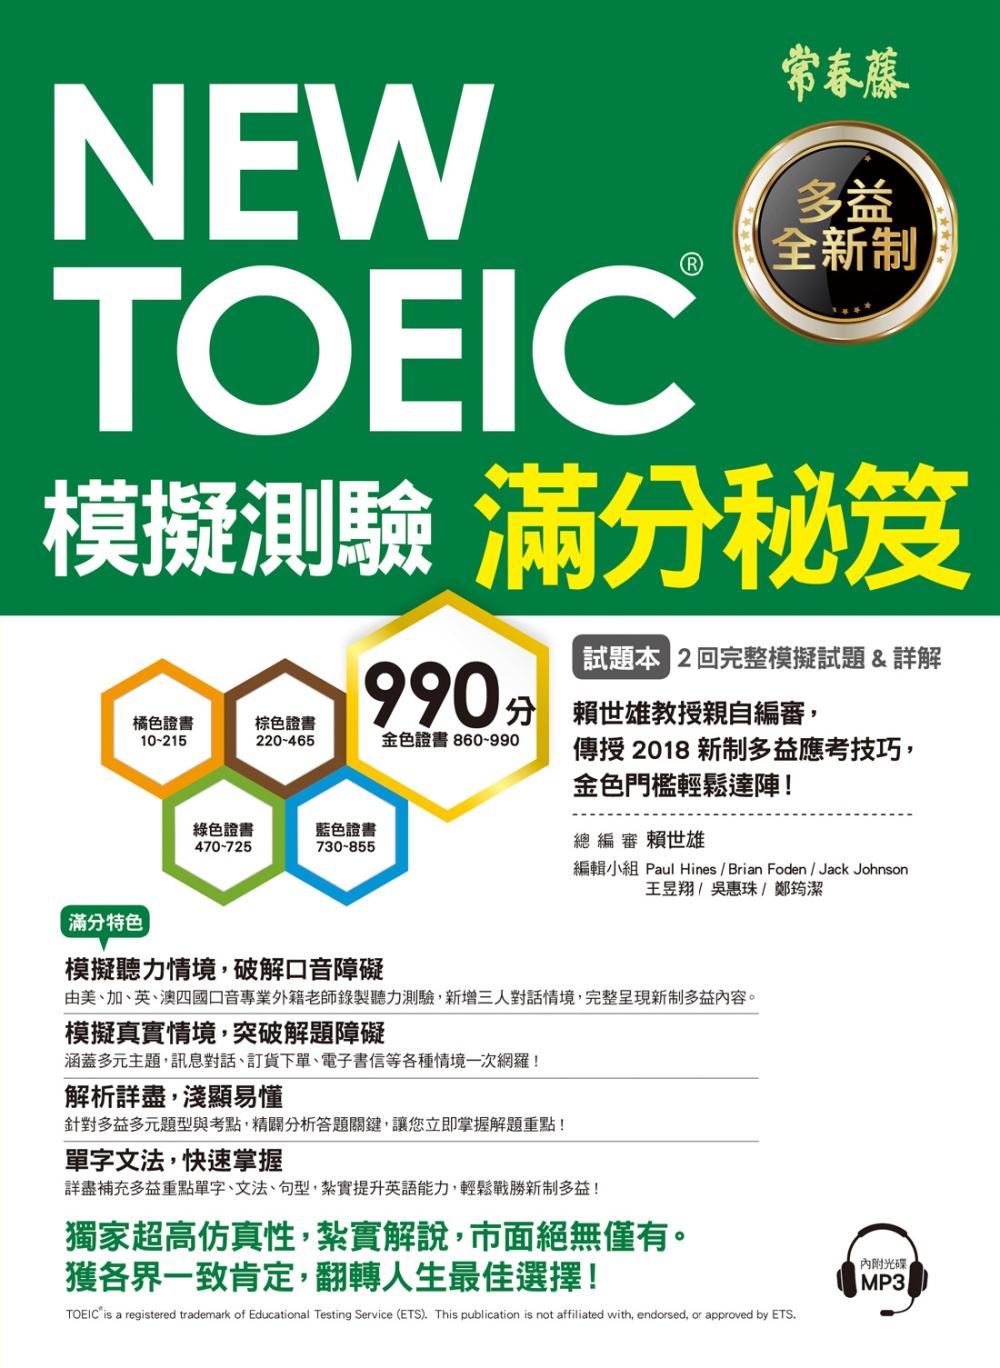 NEW TOEIC 模擬測驗 滿分秘笈(試題本+詳解本+1MP3)